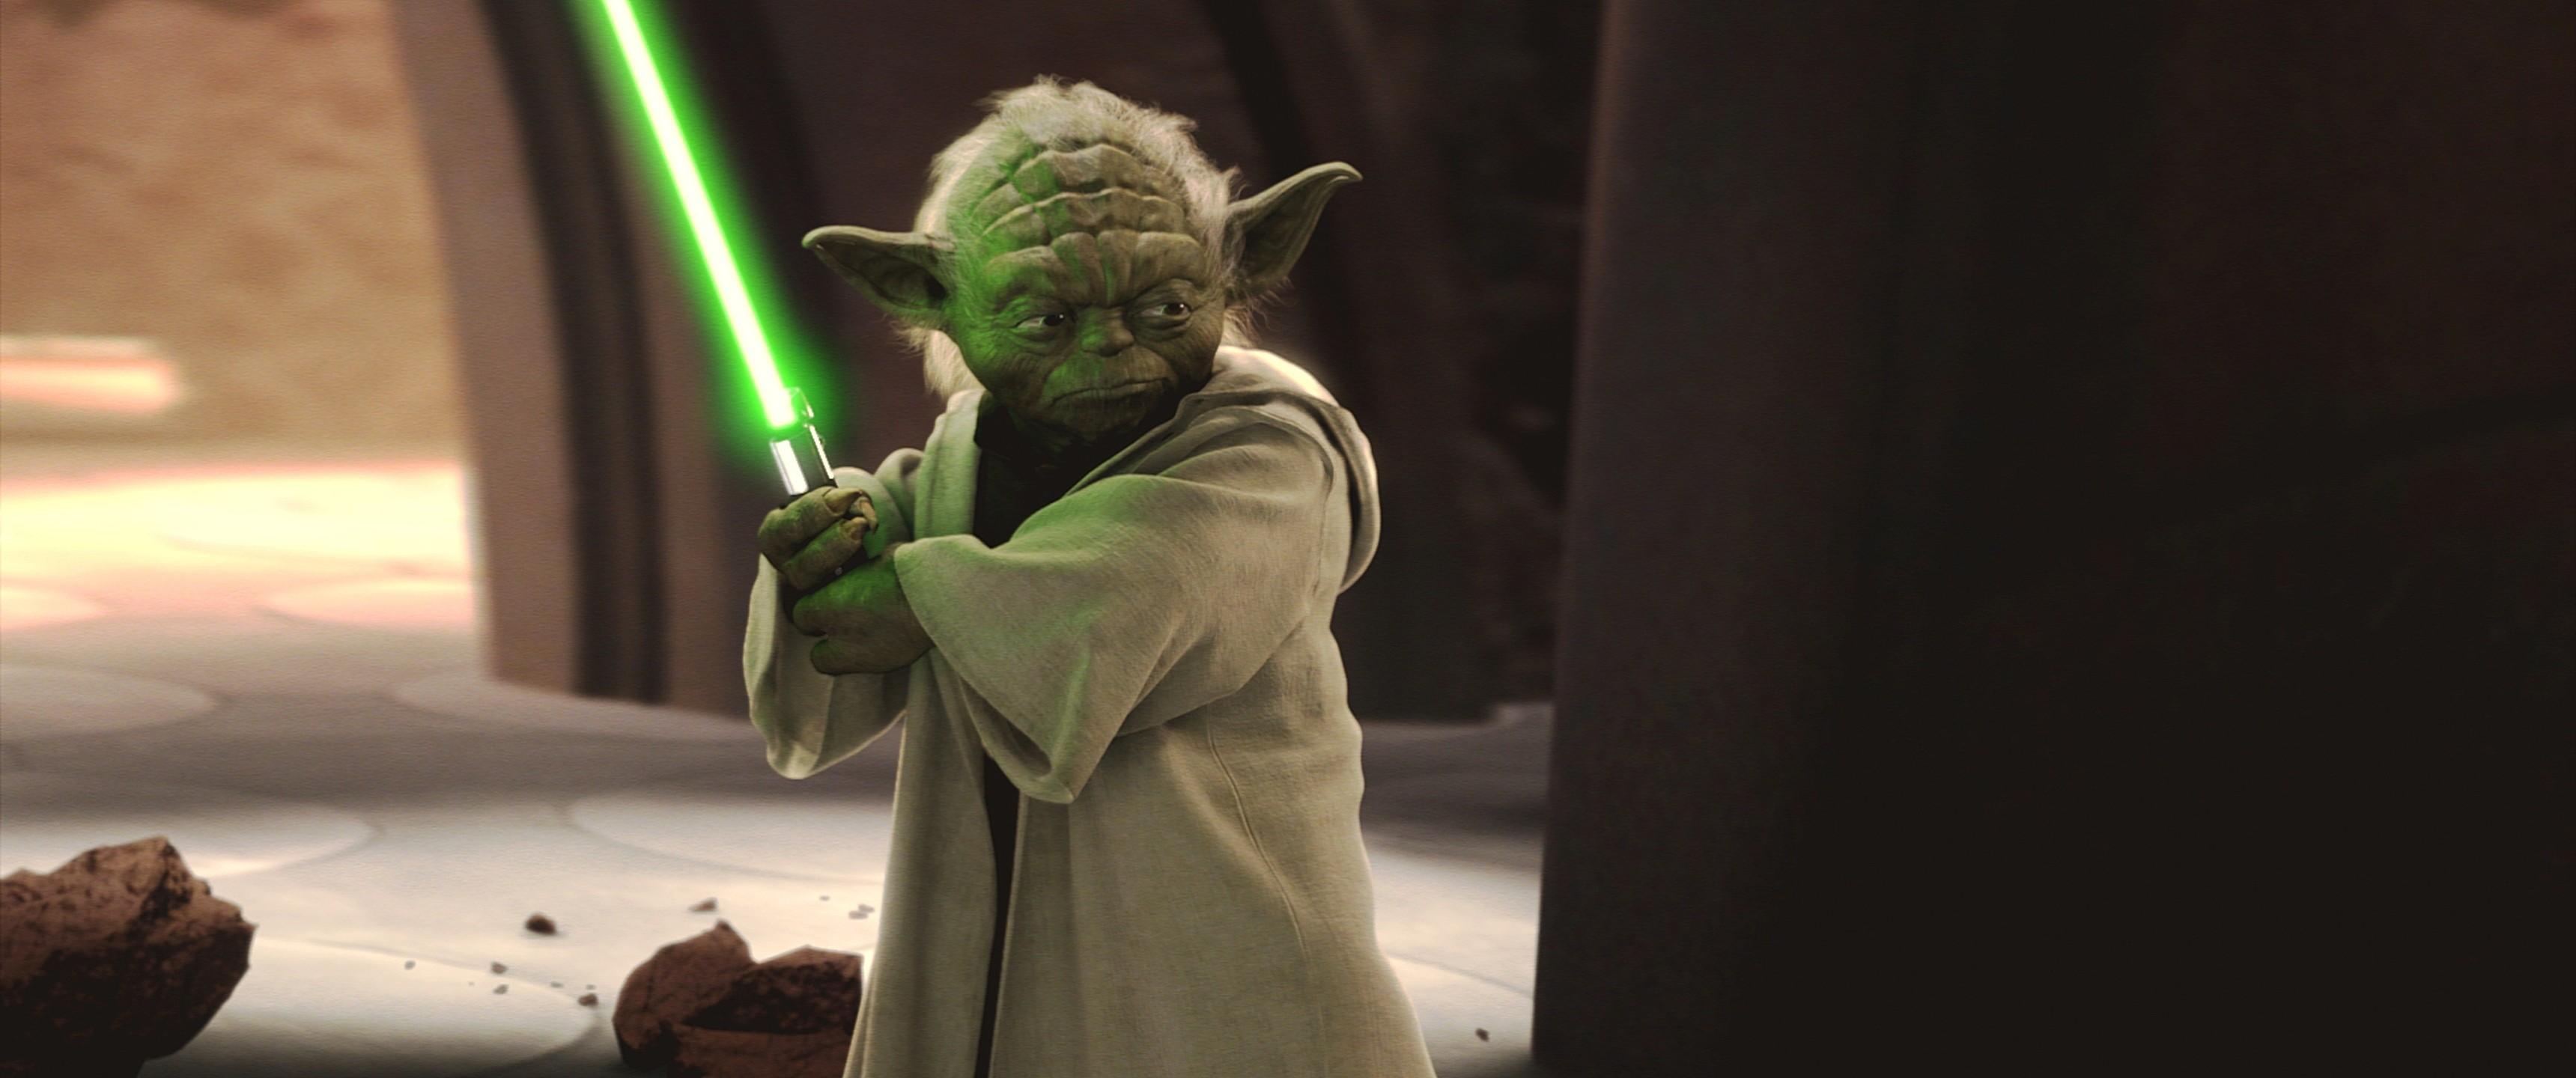 3440x1440 Wallpaper Star Wars: Yoda Wallpaper (72+ Images